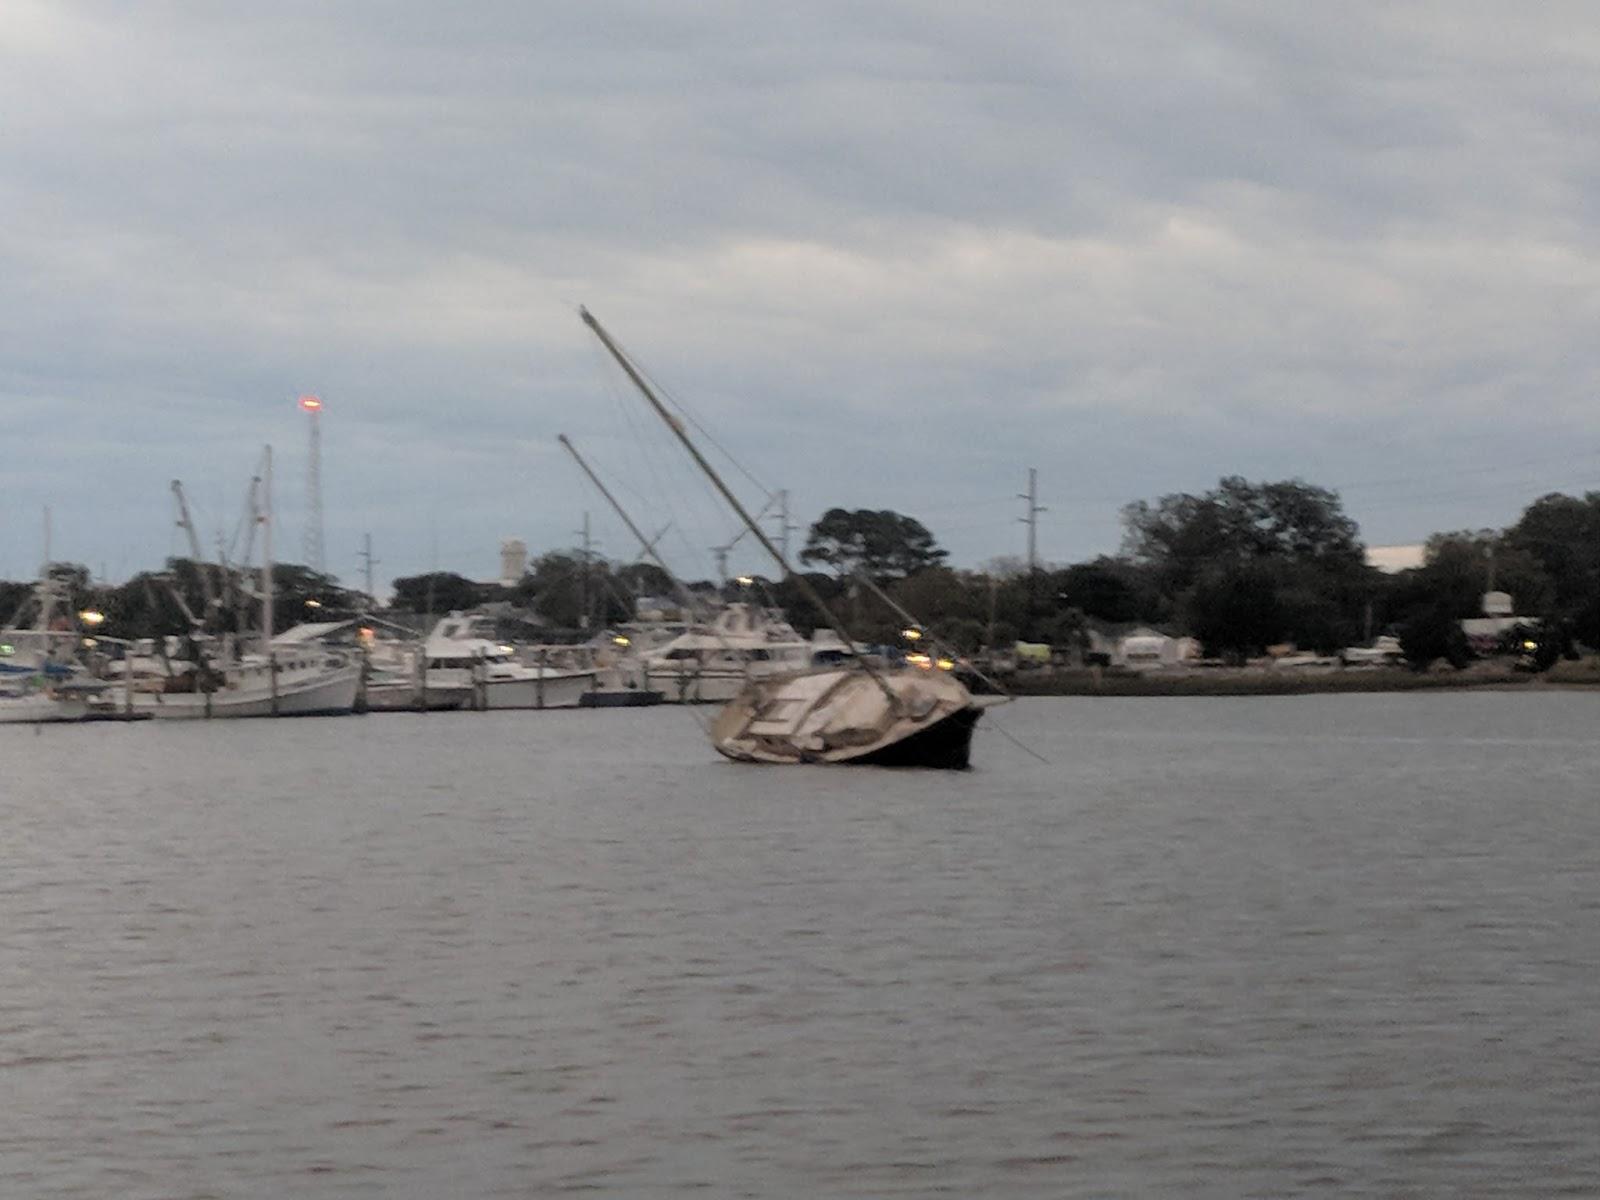 The Sailing Life: Beaufort NC to Brunswick GA